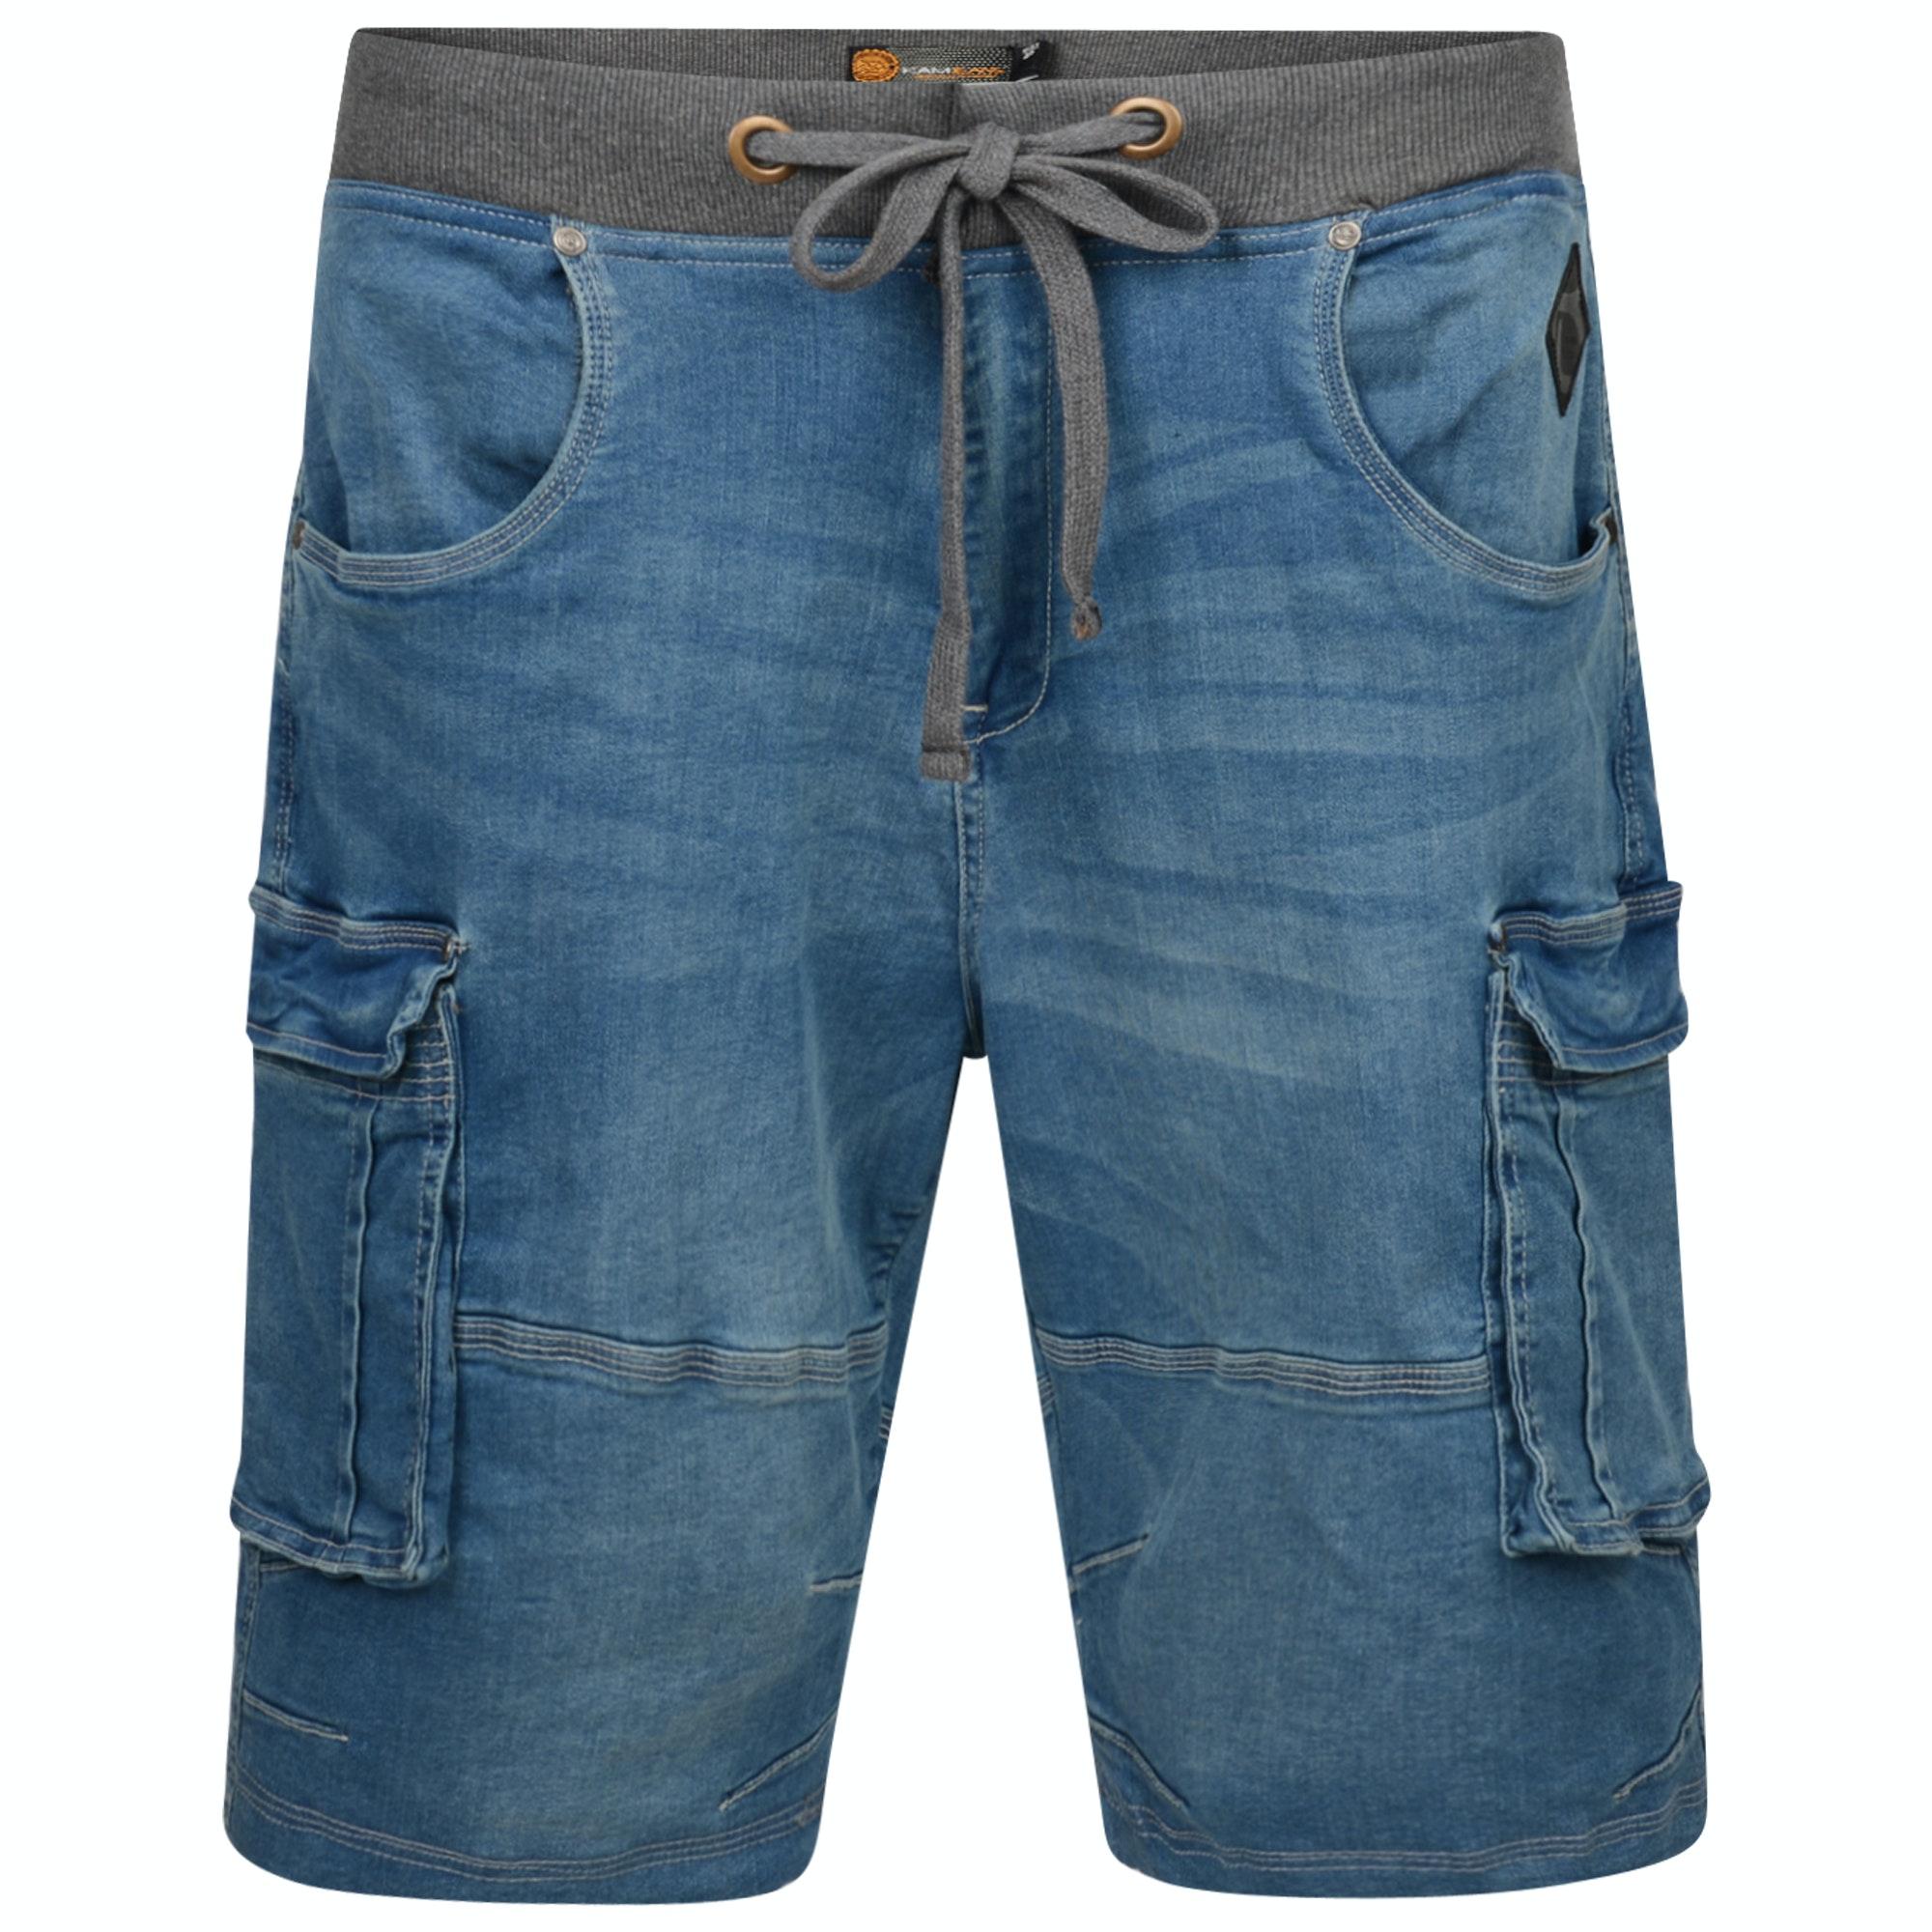 KAM Dito Denim Shorts Light Used